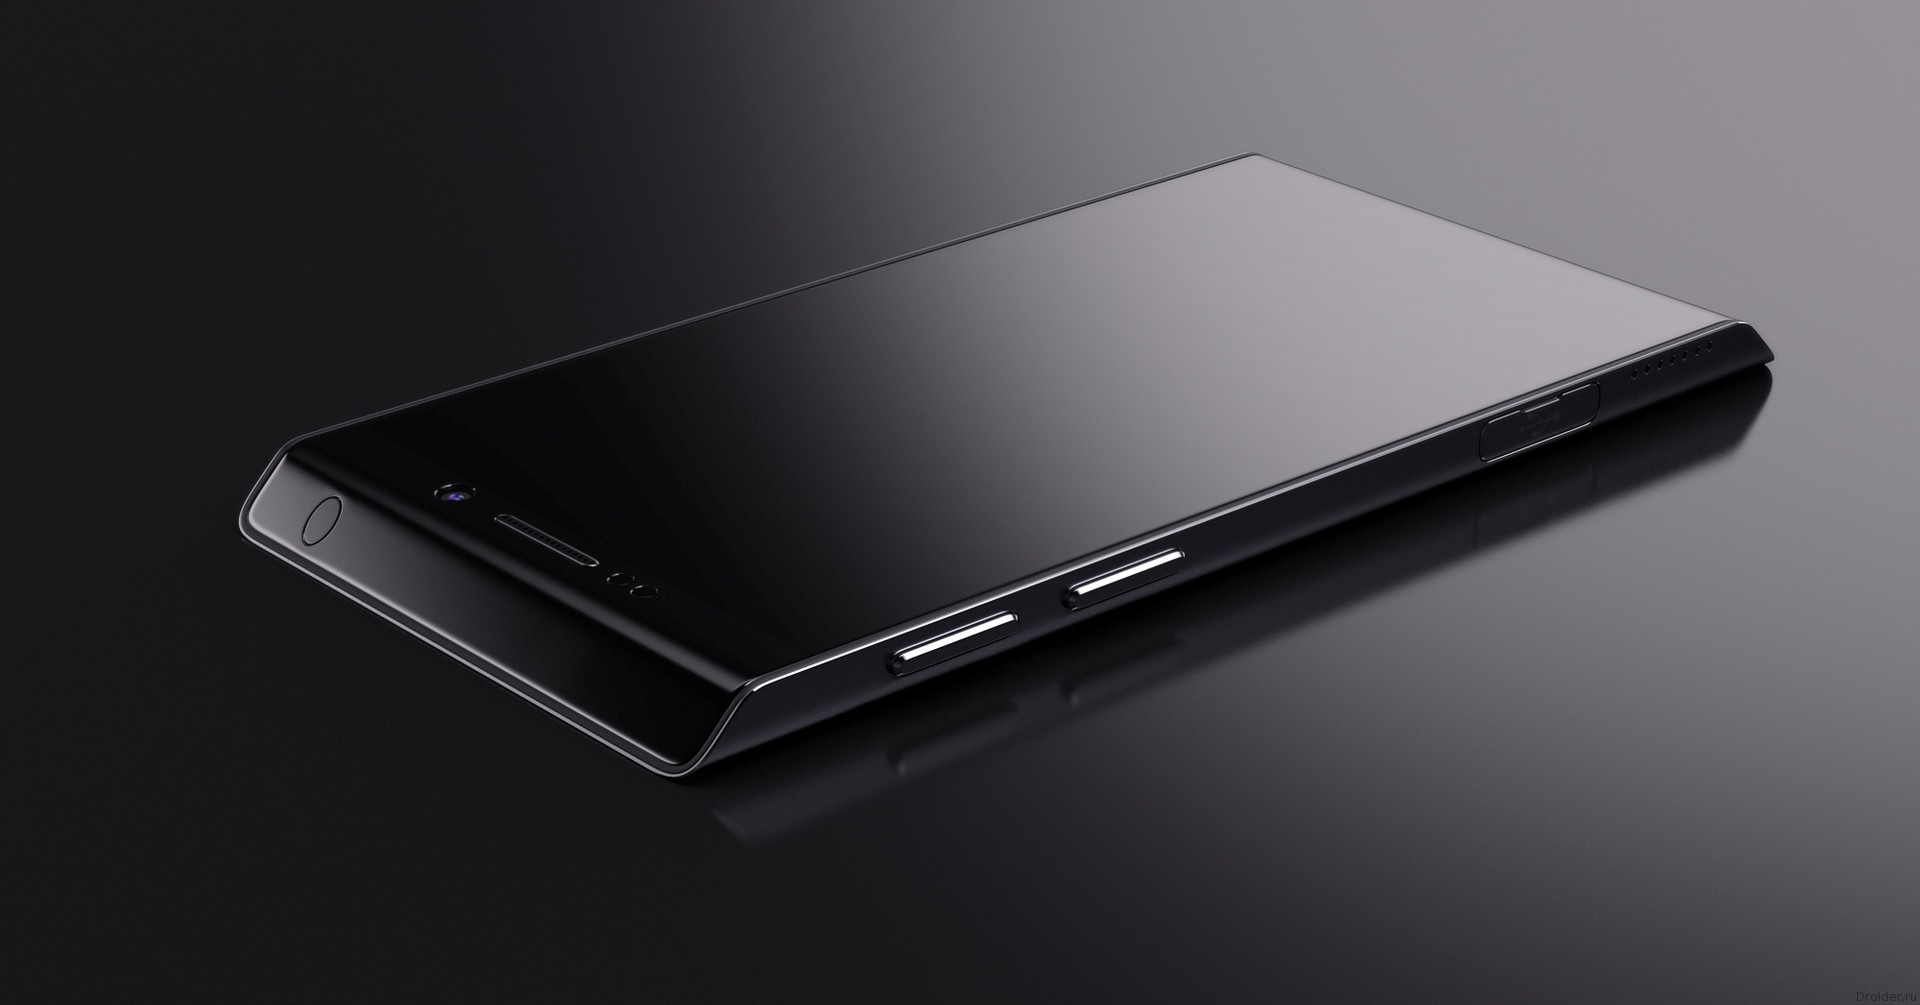 Galaxy S7 Premium Edition